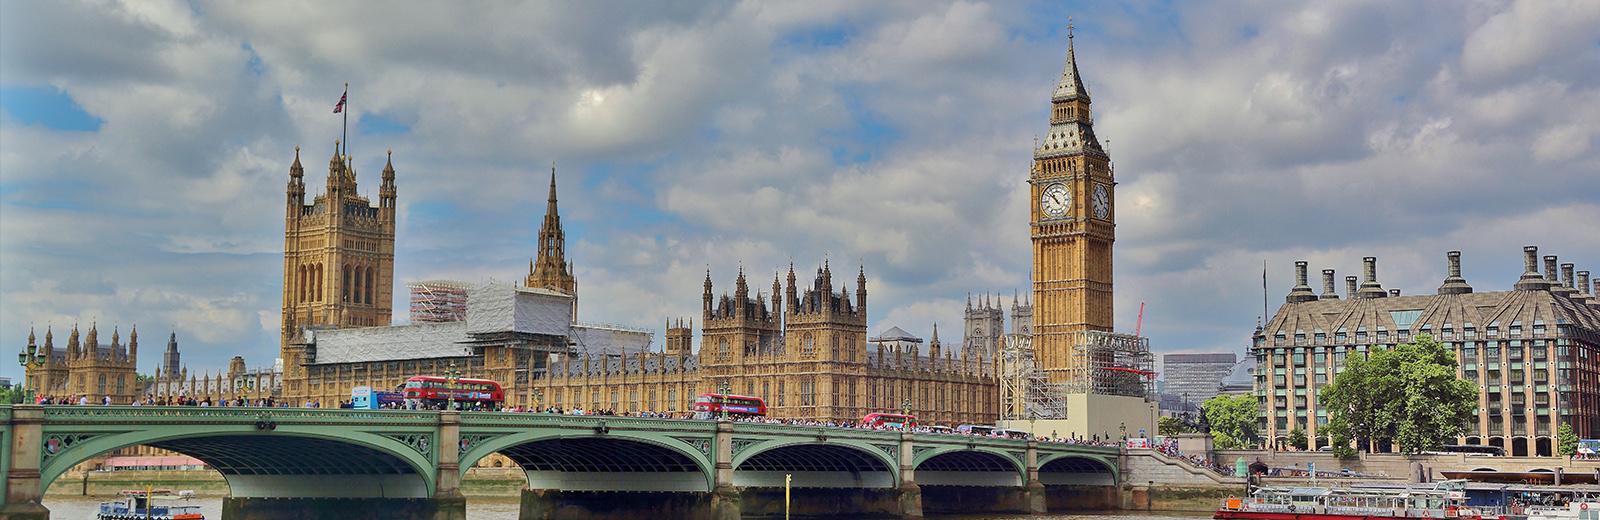 Government UK parliament